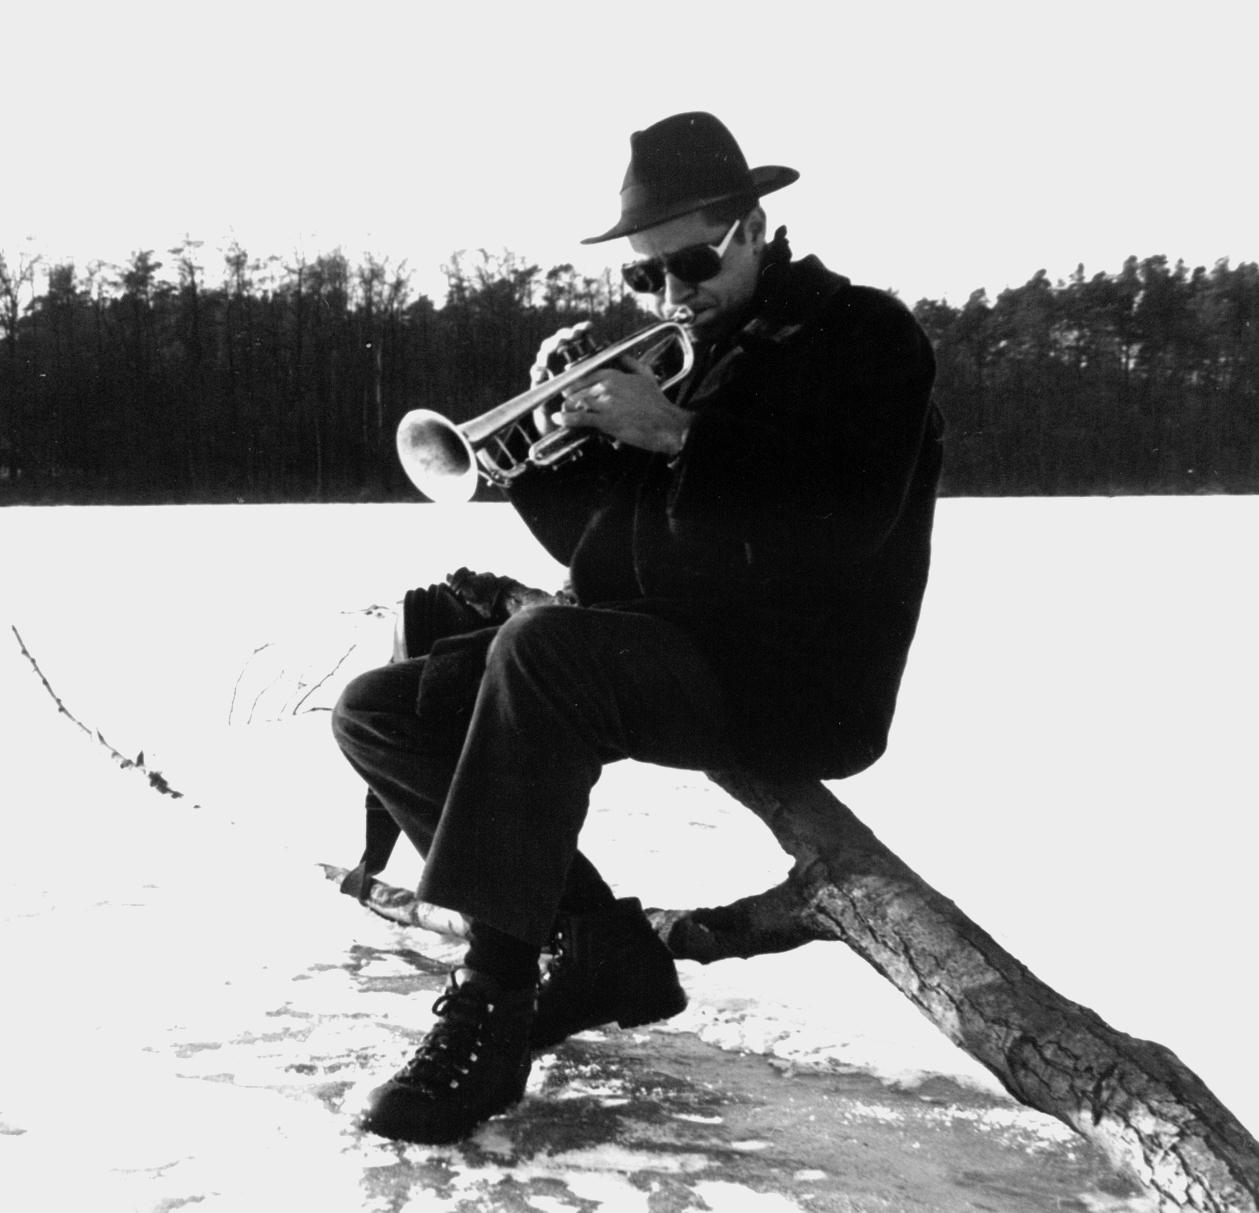 Guy Bettini Play on a Icelake